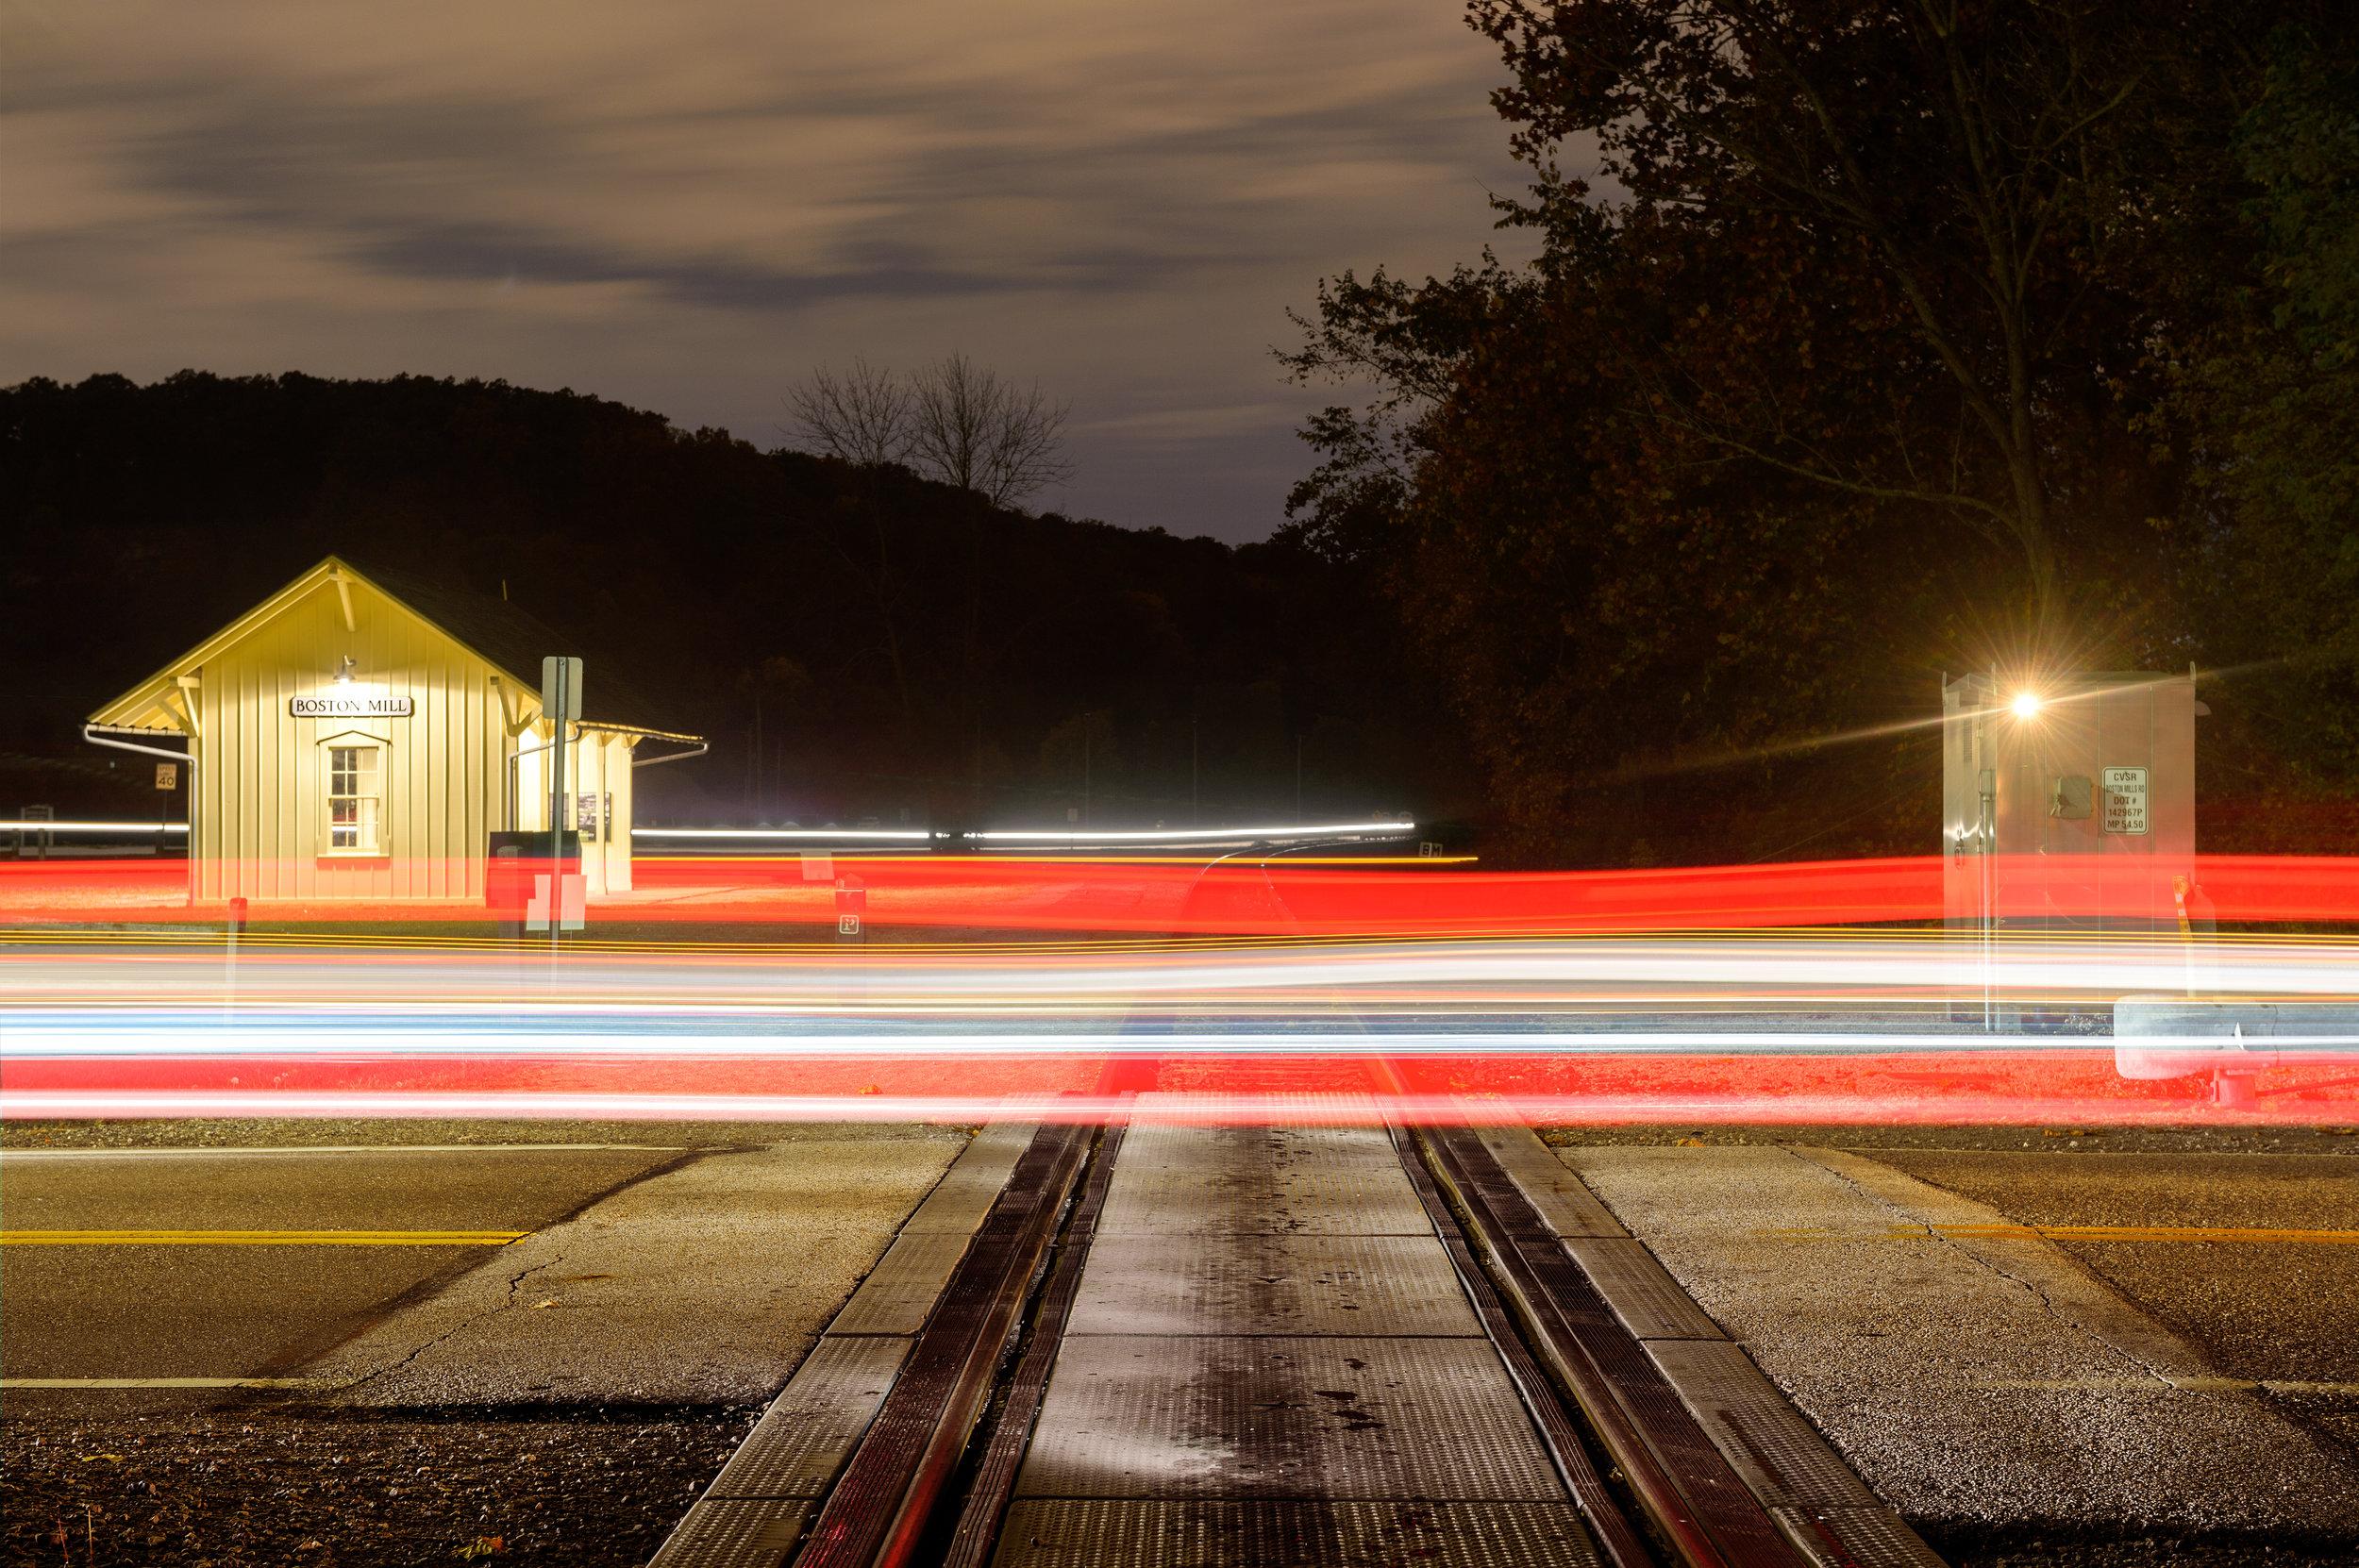 Boston_Mill,_Tracks,_Car_Trails.jpg